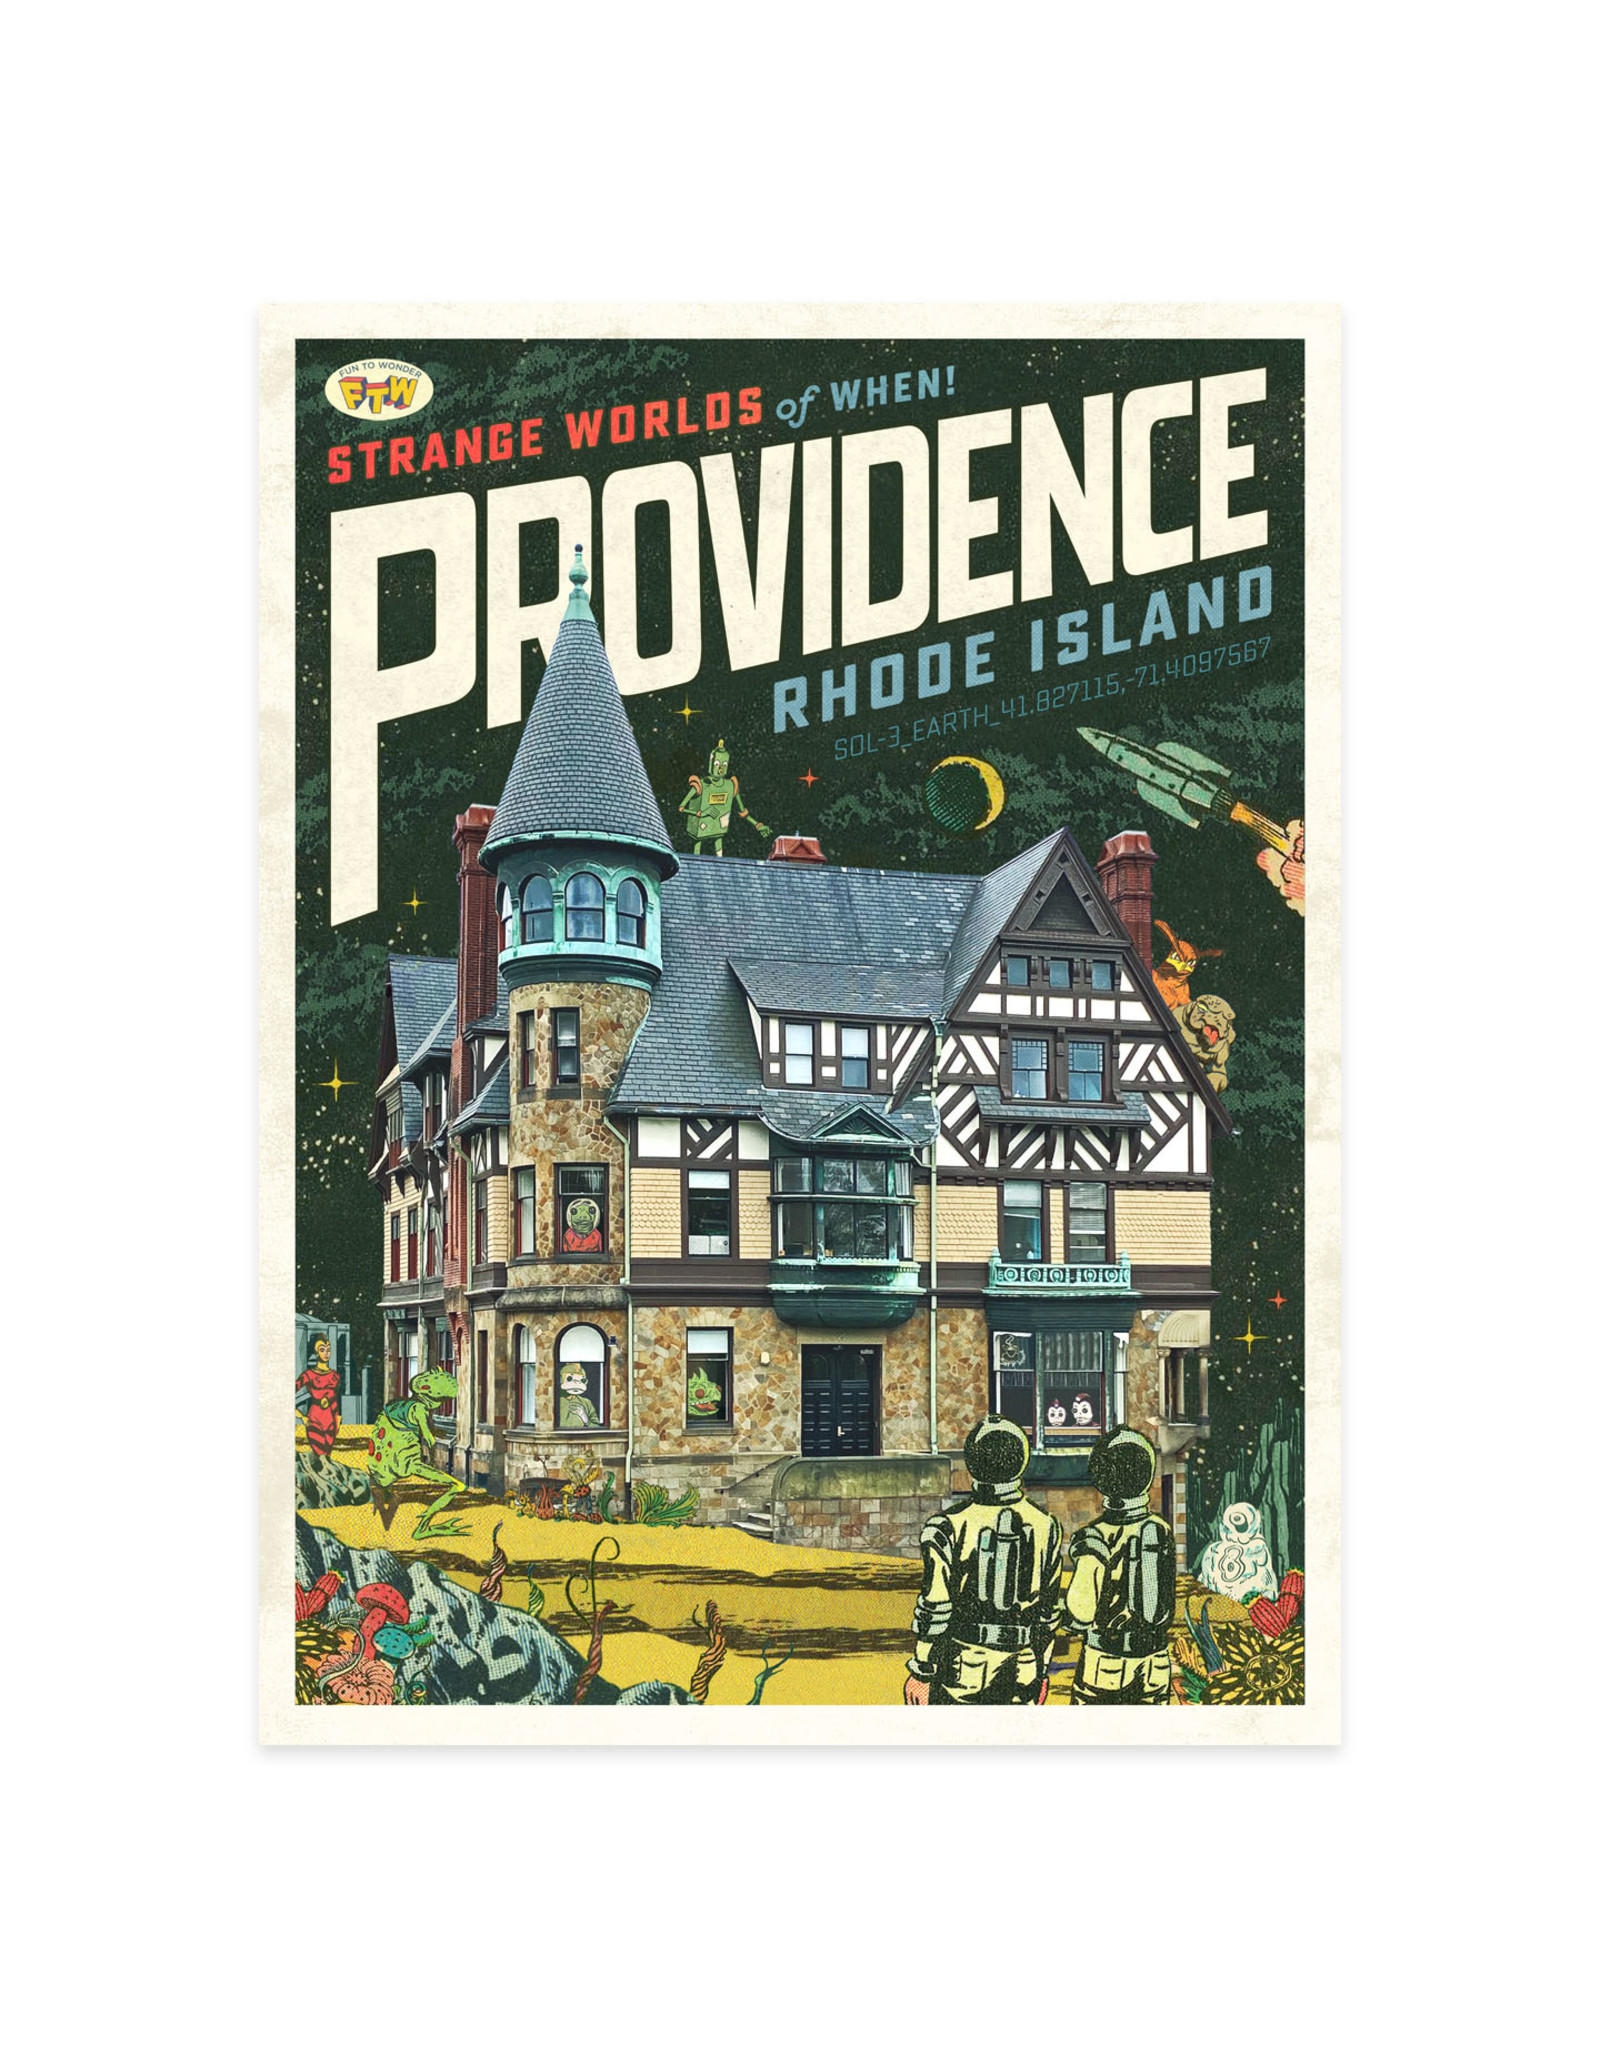 Strange Worlds of When! Postcard - Carr Haus